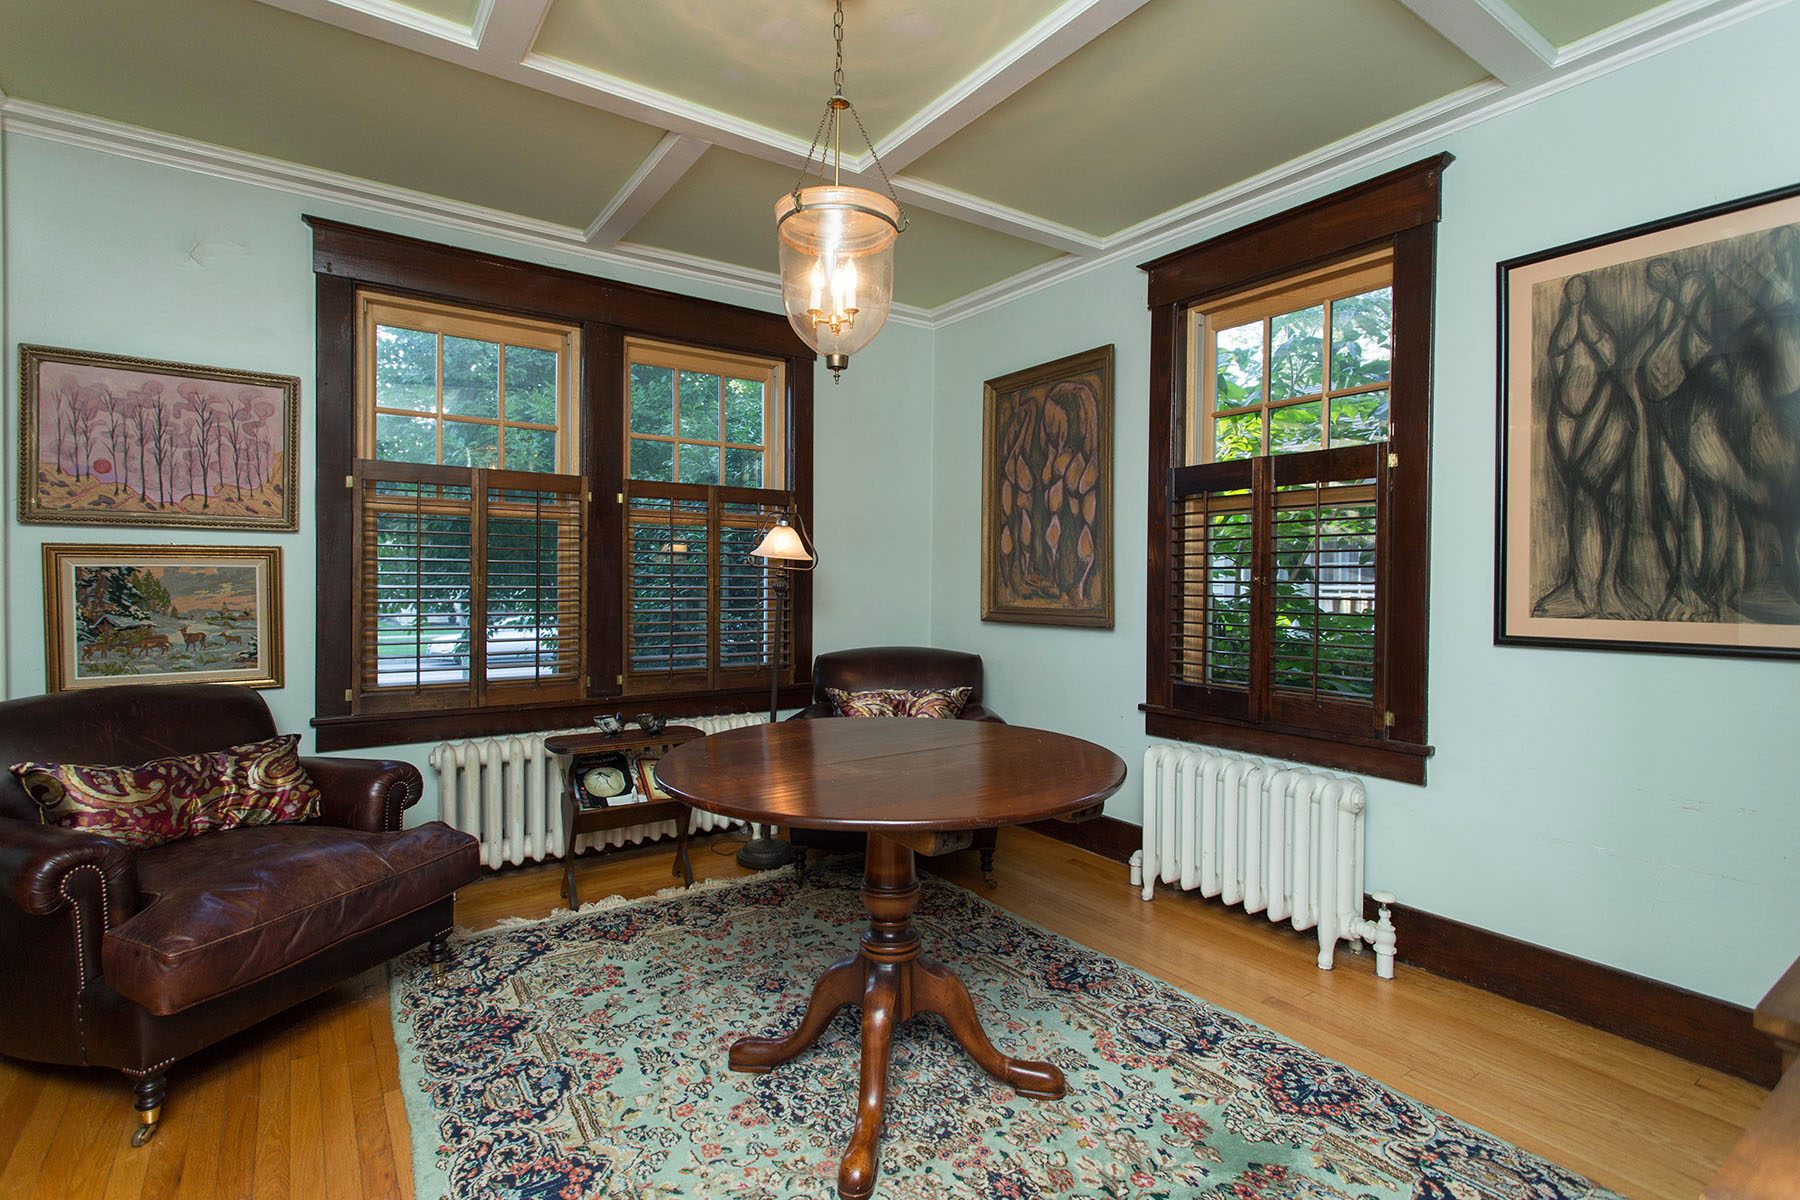 Additional photo for property listing at East Side Saratoga Springs Home 200  East Av Saratoga Springs, Nueva York 12866 Estados Unidos